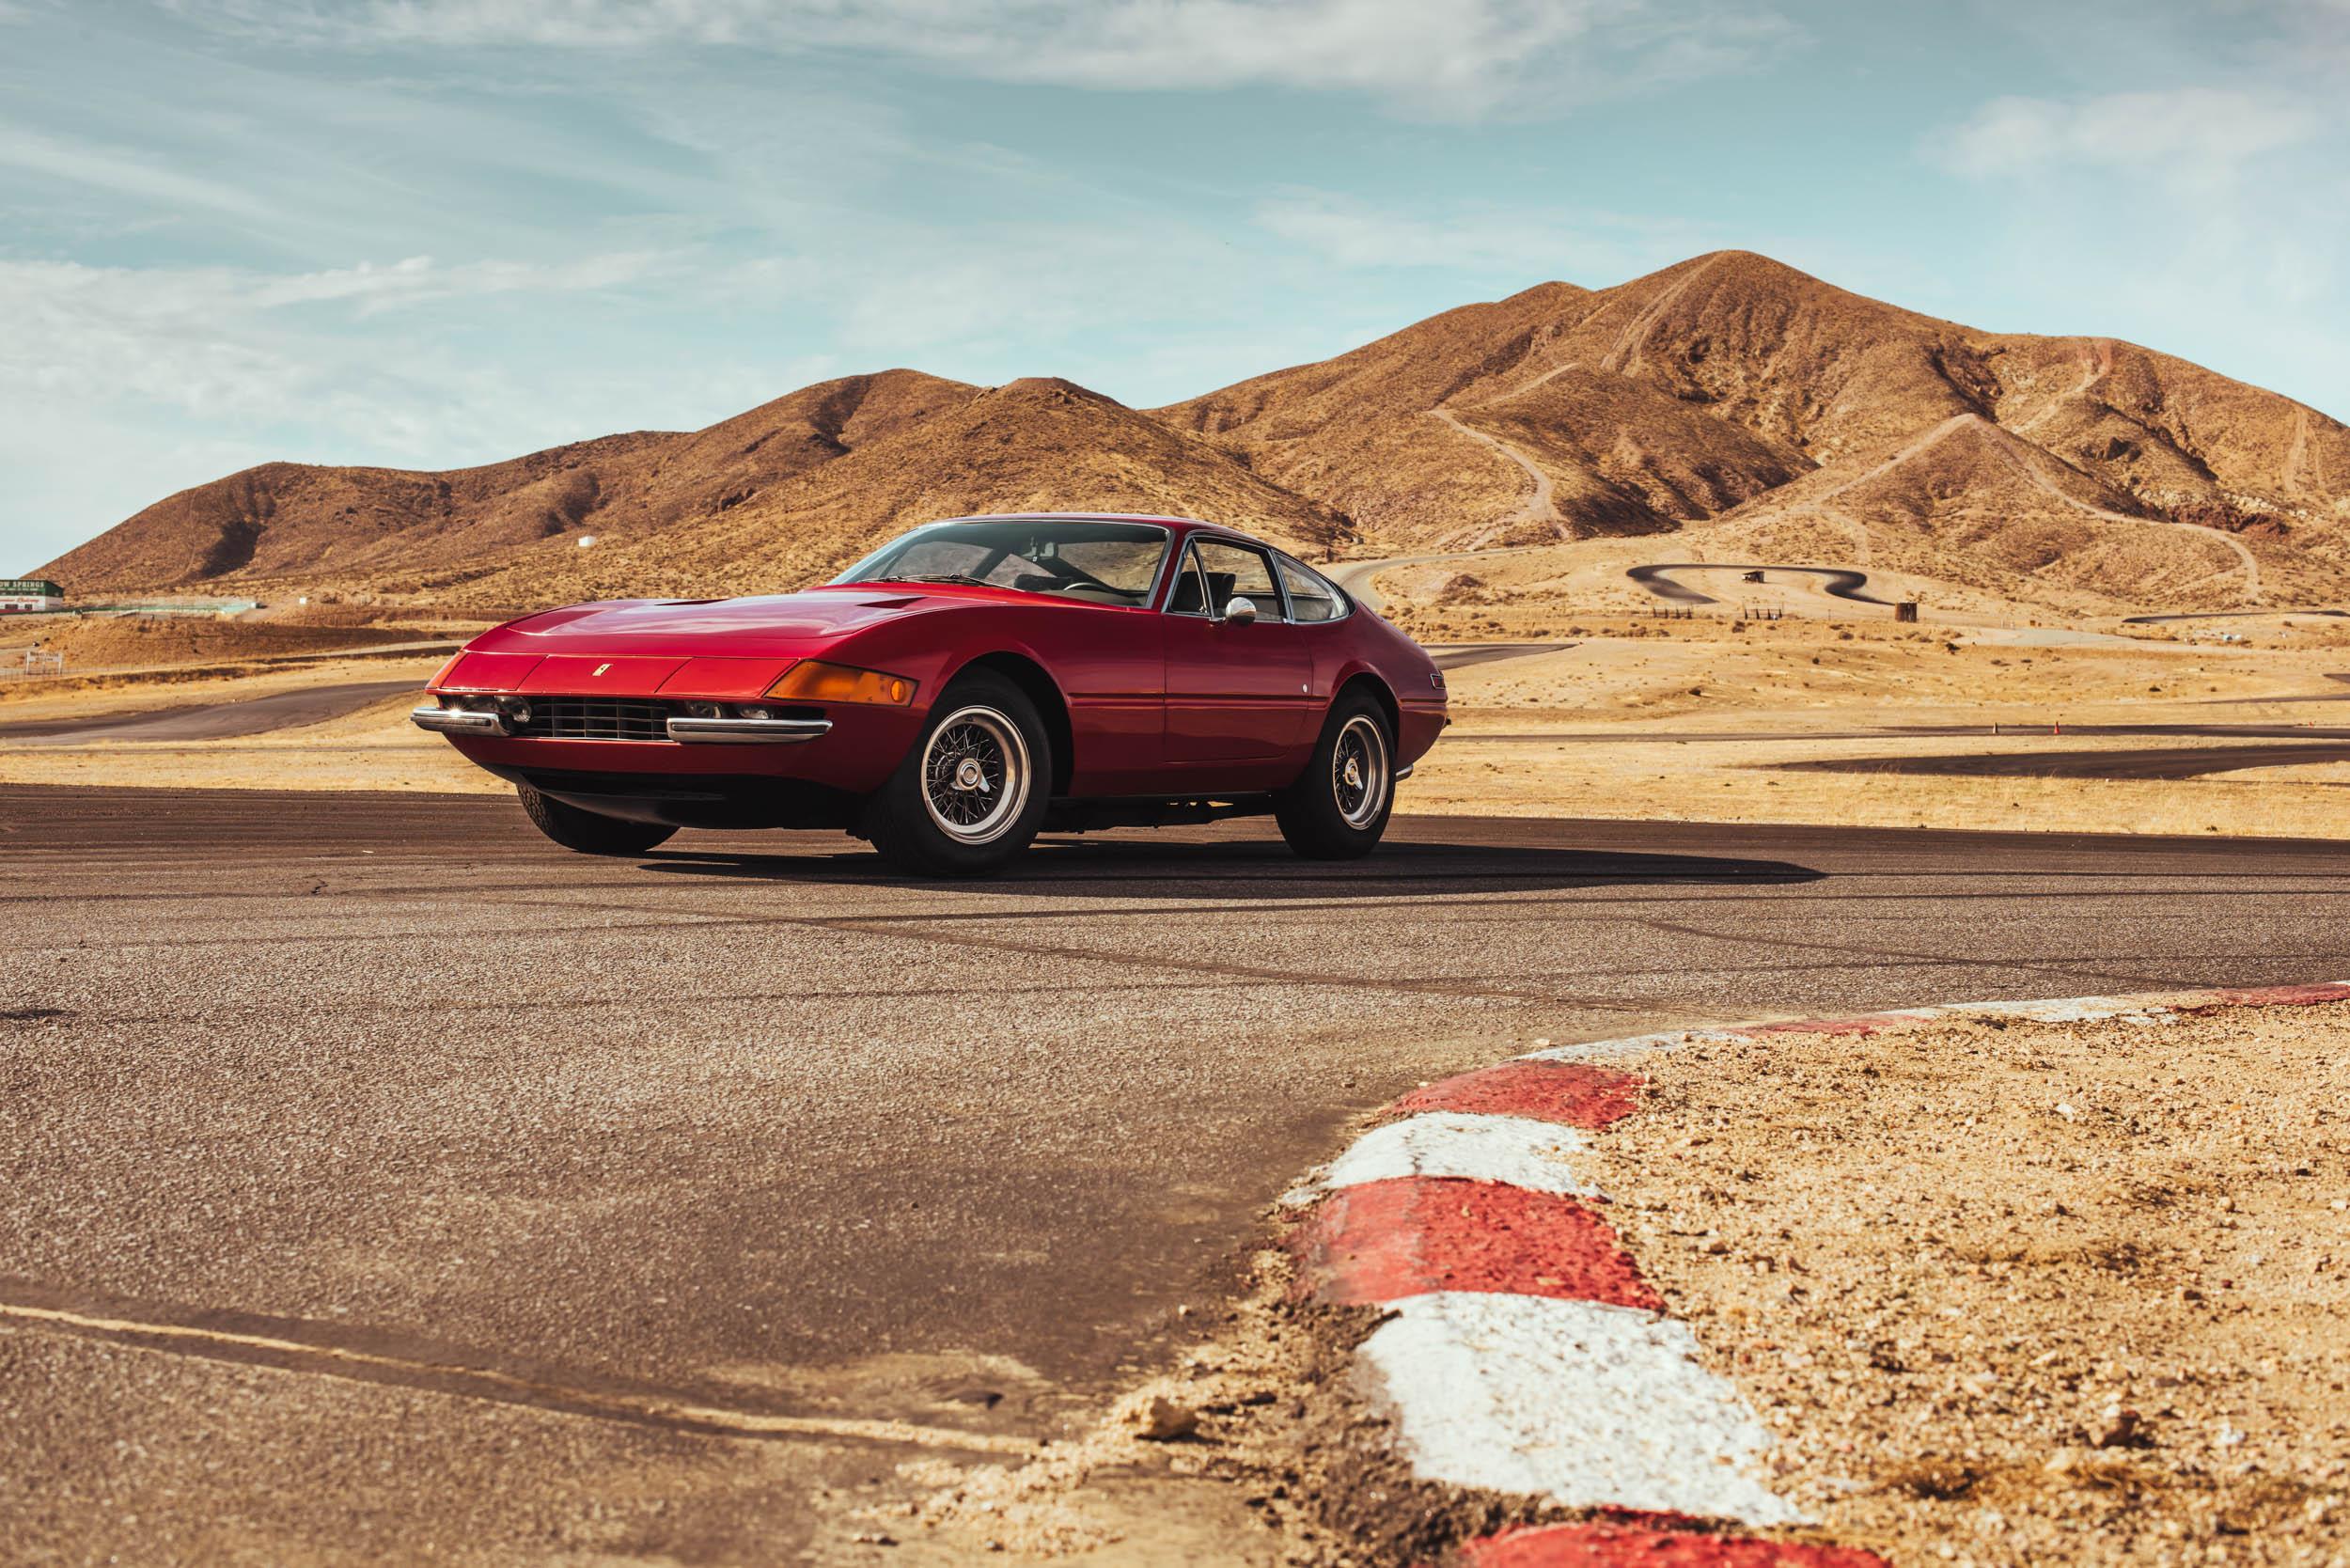 1971 Ferrari Daytona 365 GTB/4 front 3/4 on the track